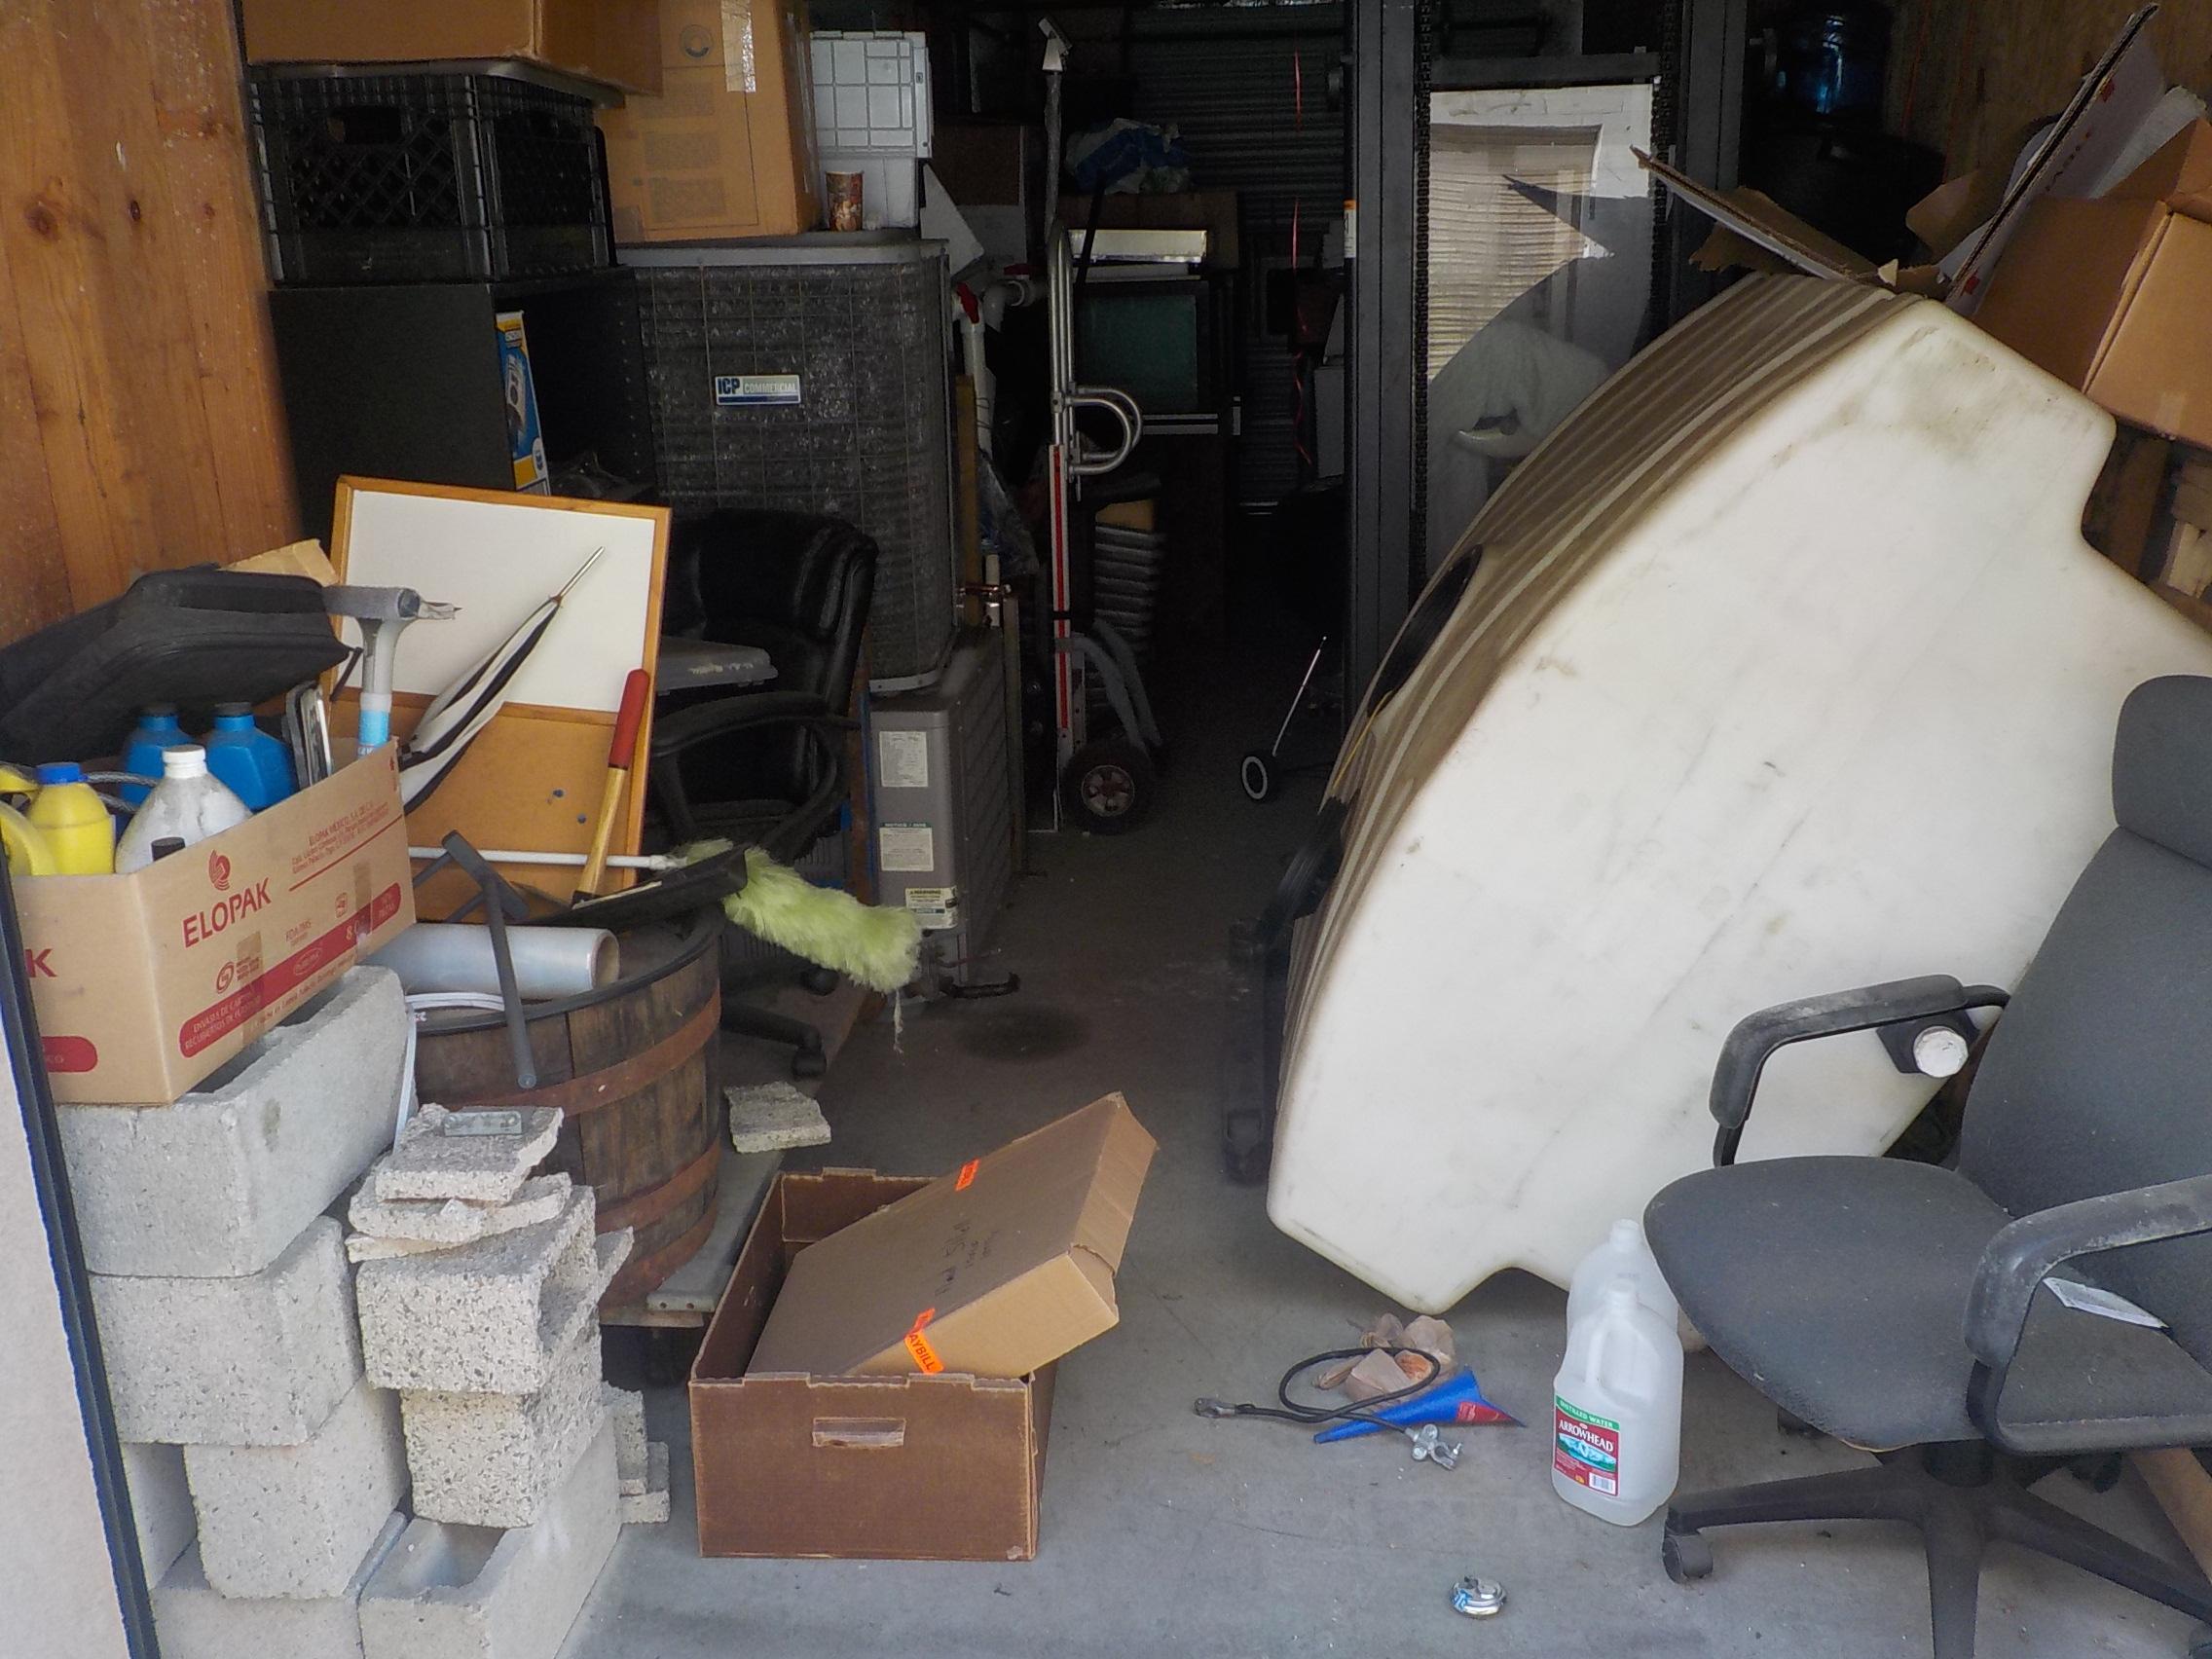 unit a1002 san diego california sorrento valley self storage bid13. Black Bedroom Furniture Sets. Home Design Ideas